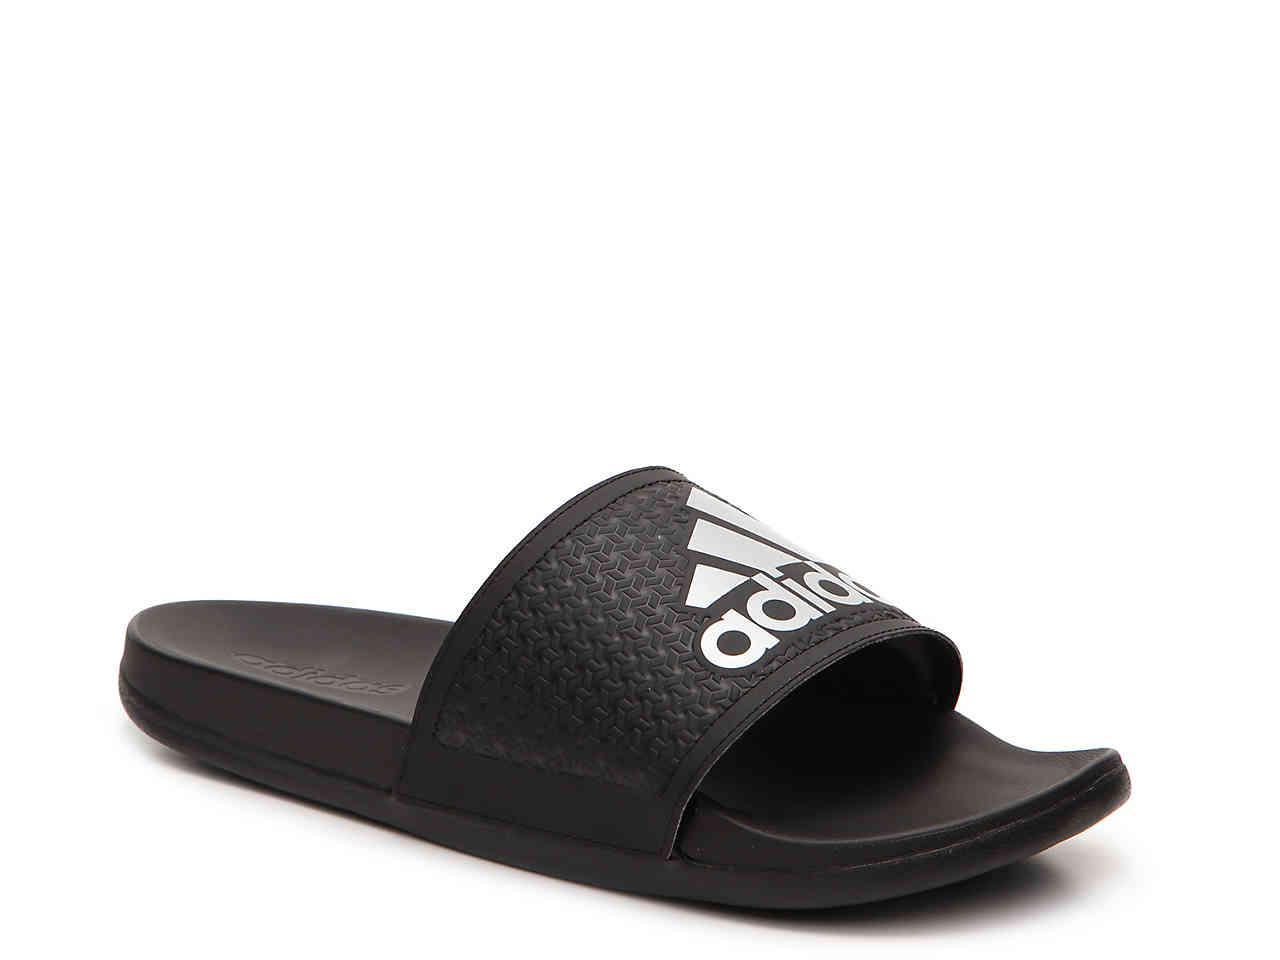 5cb16ec37 Lyst - adidas Adilette Supercloud Plus Slide Sandal in Black for Men